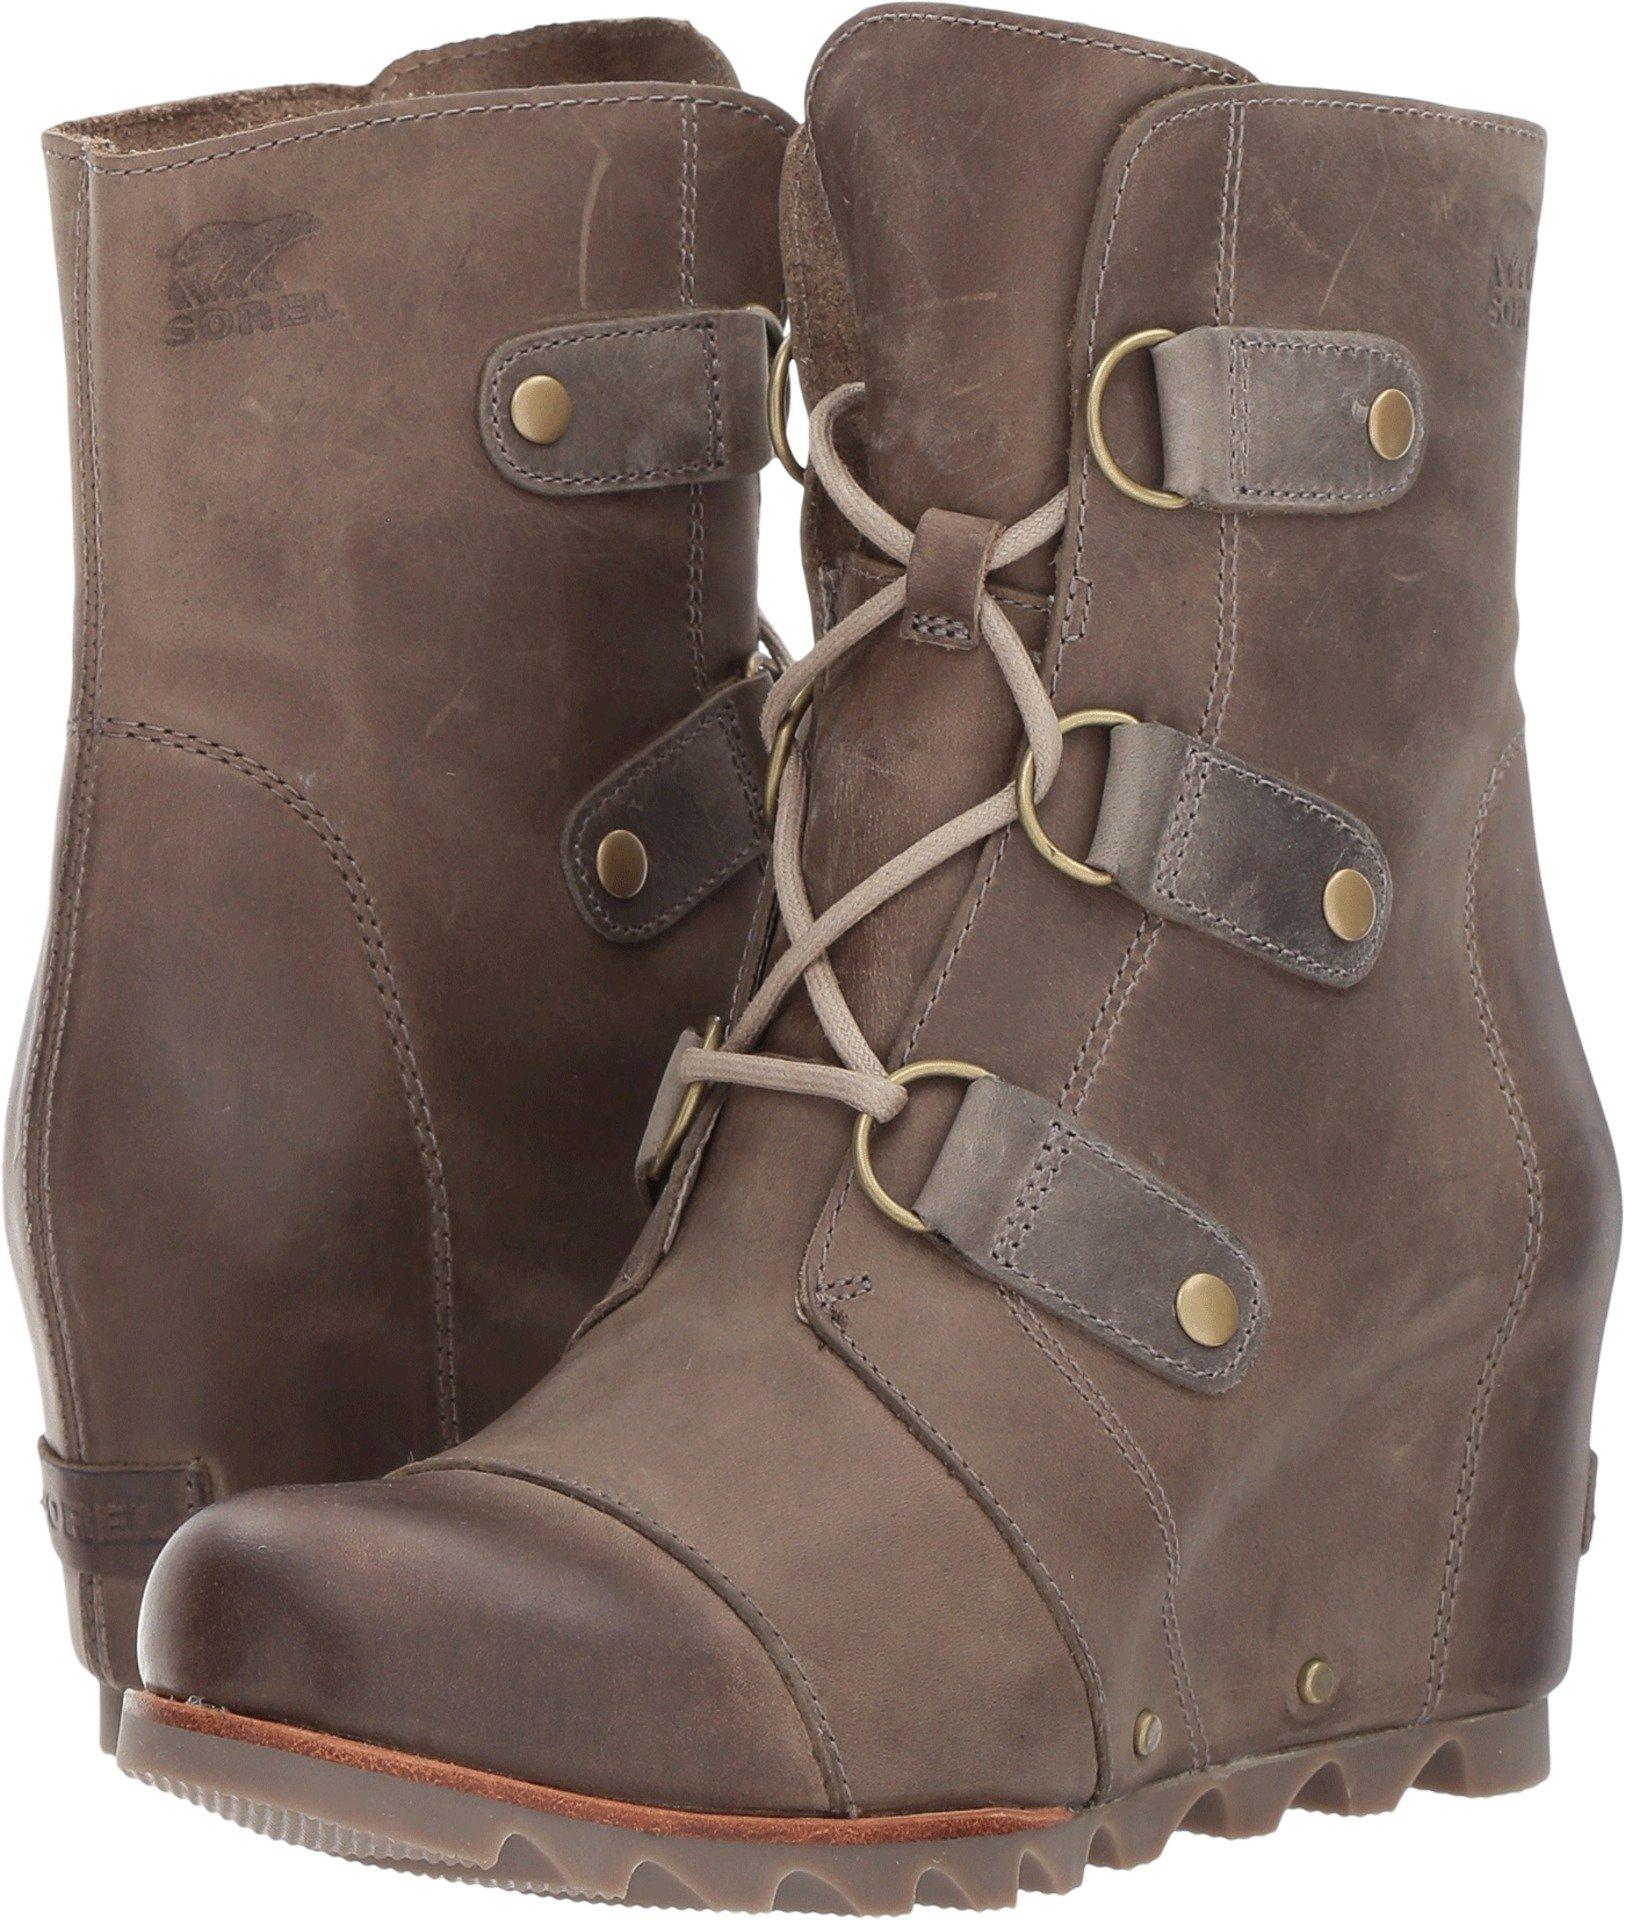 Sorel Women's Joan of Arctic Wedge Boots, Kettle, 10 B(M) US